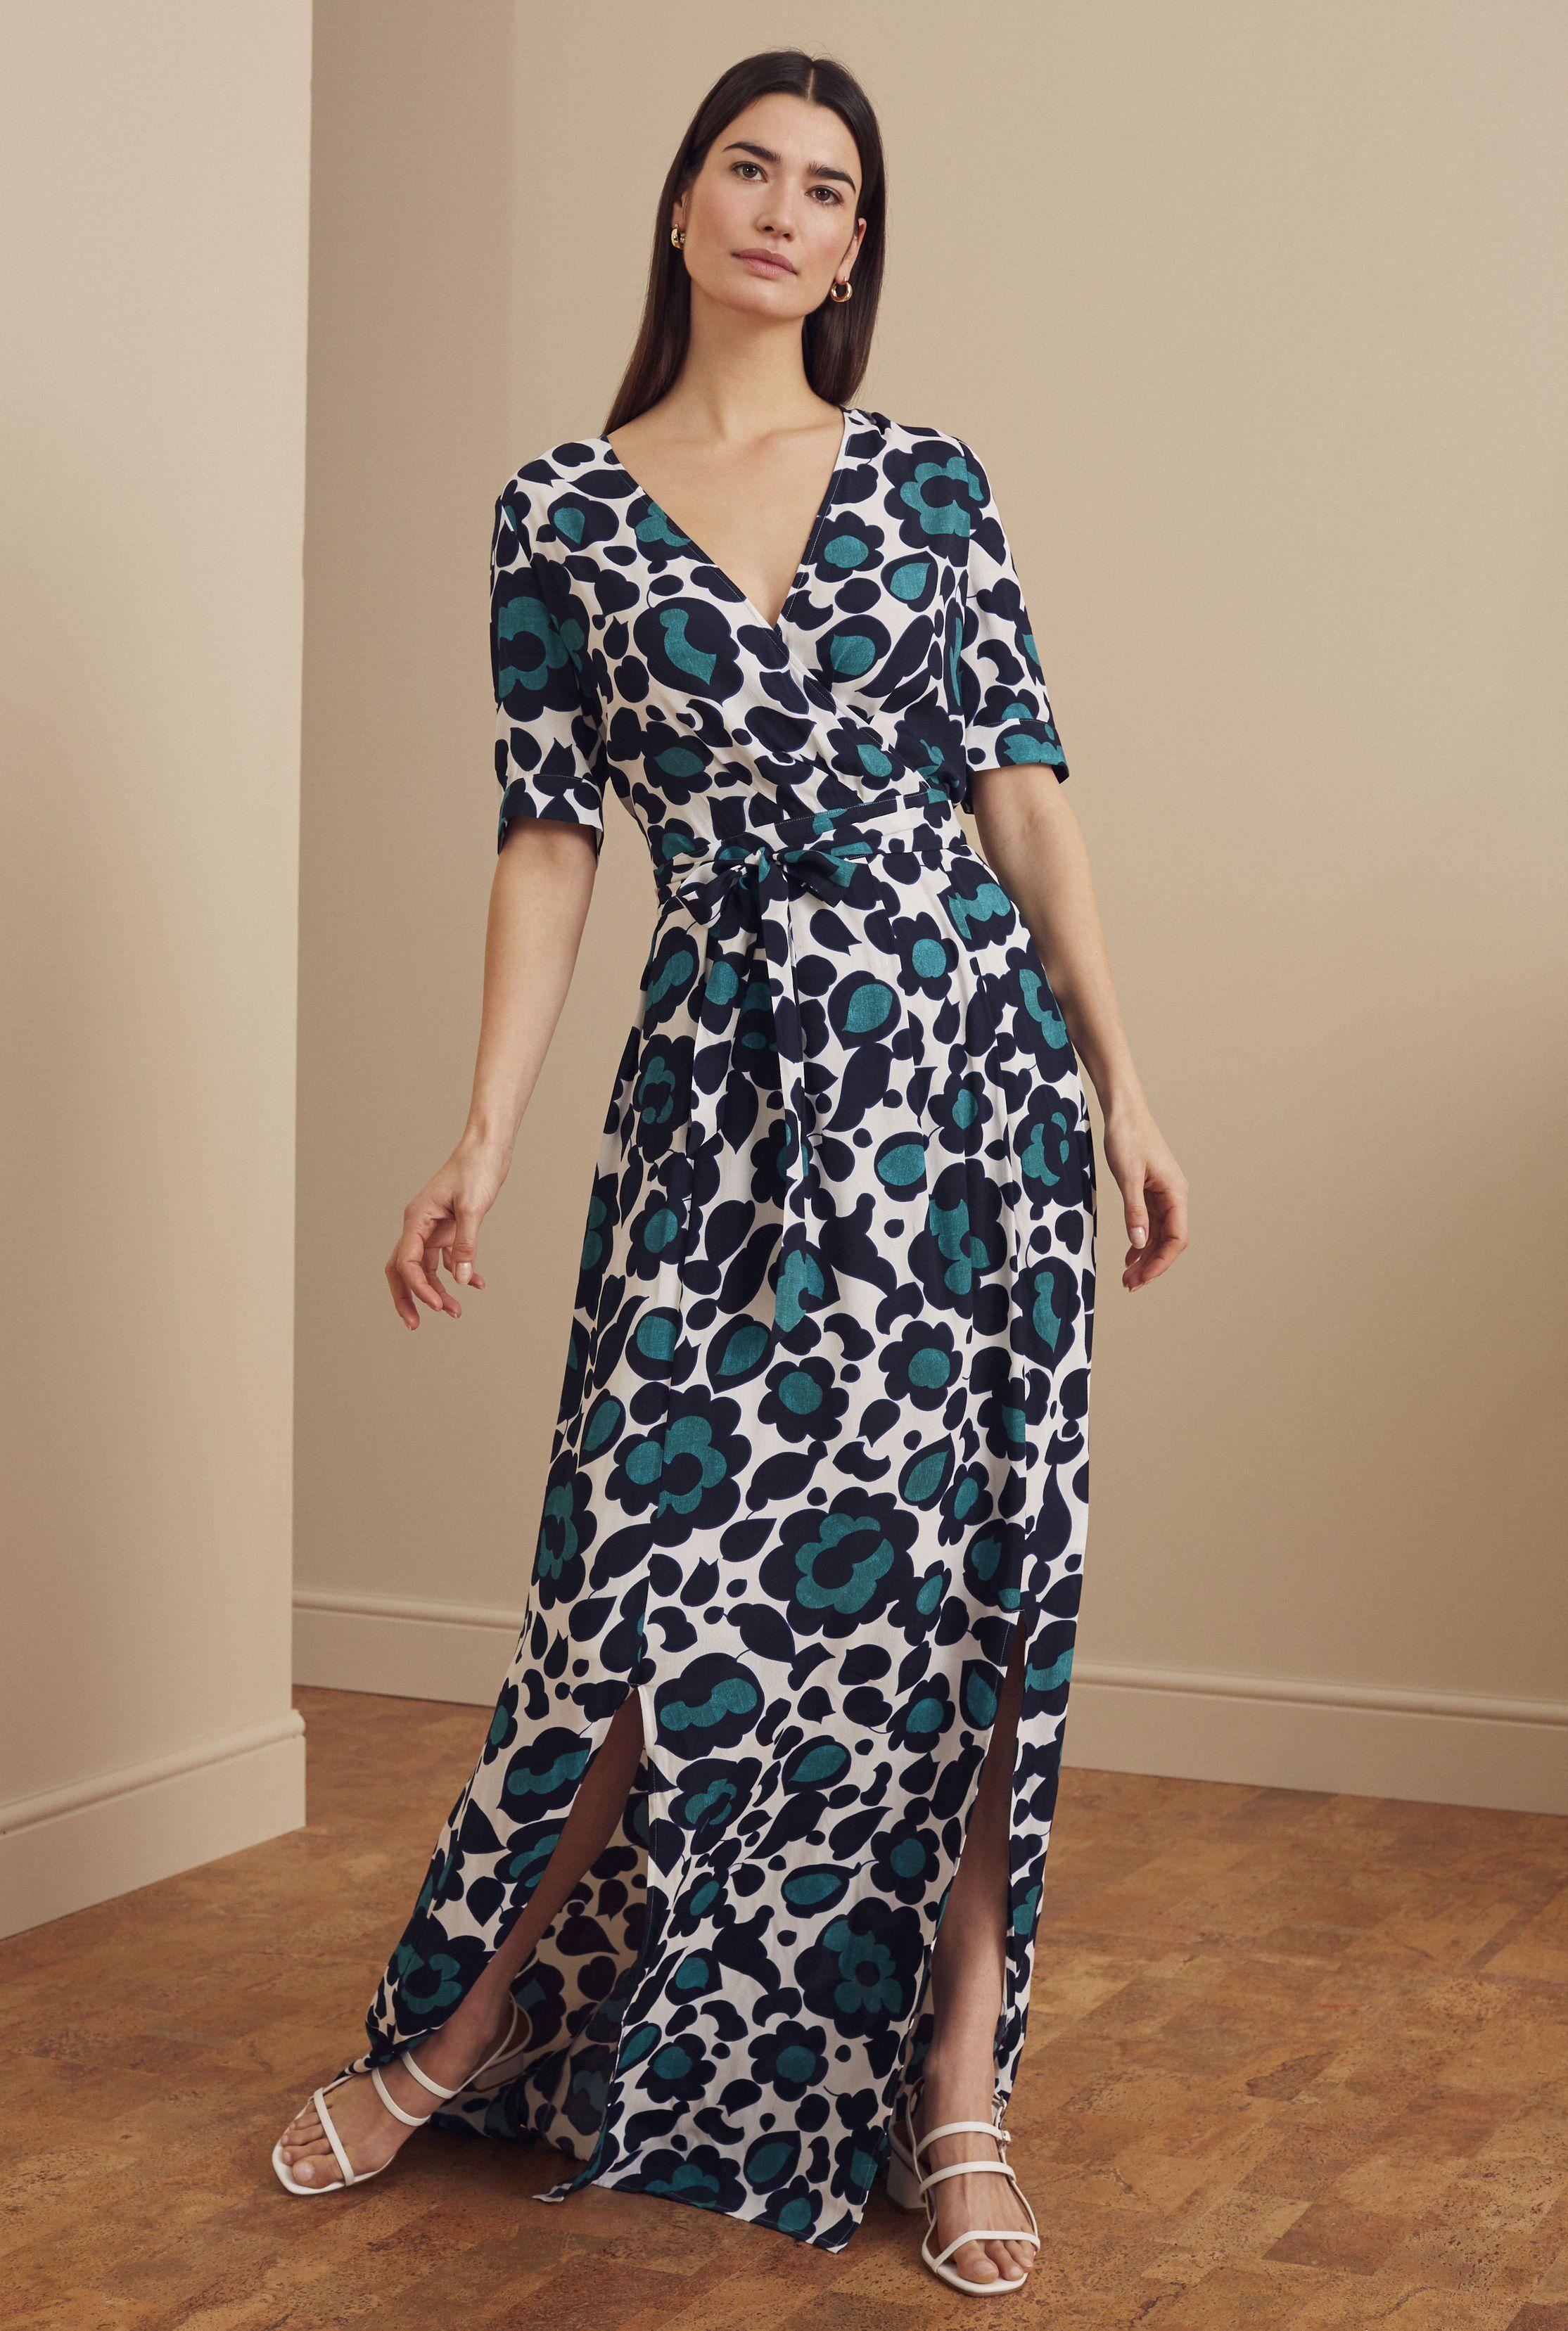 Tall Abstract Floral Fixed Wrap Maxi Dress Long Tall Sally Us In 2020 Maxi Dress Maxi Wrap Dress Tall Wrap Dress [ 3314 x 2229 Pixel ]